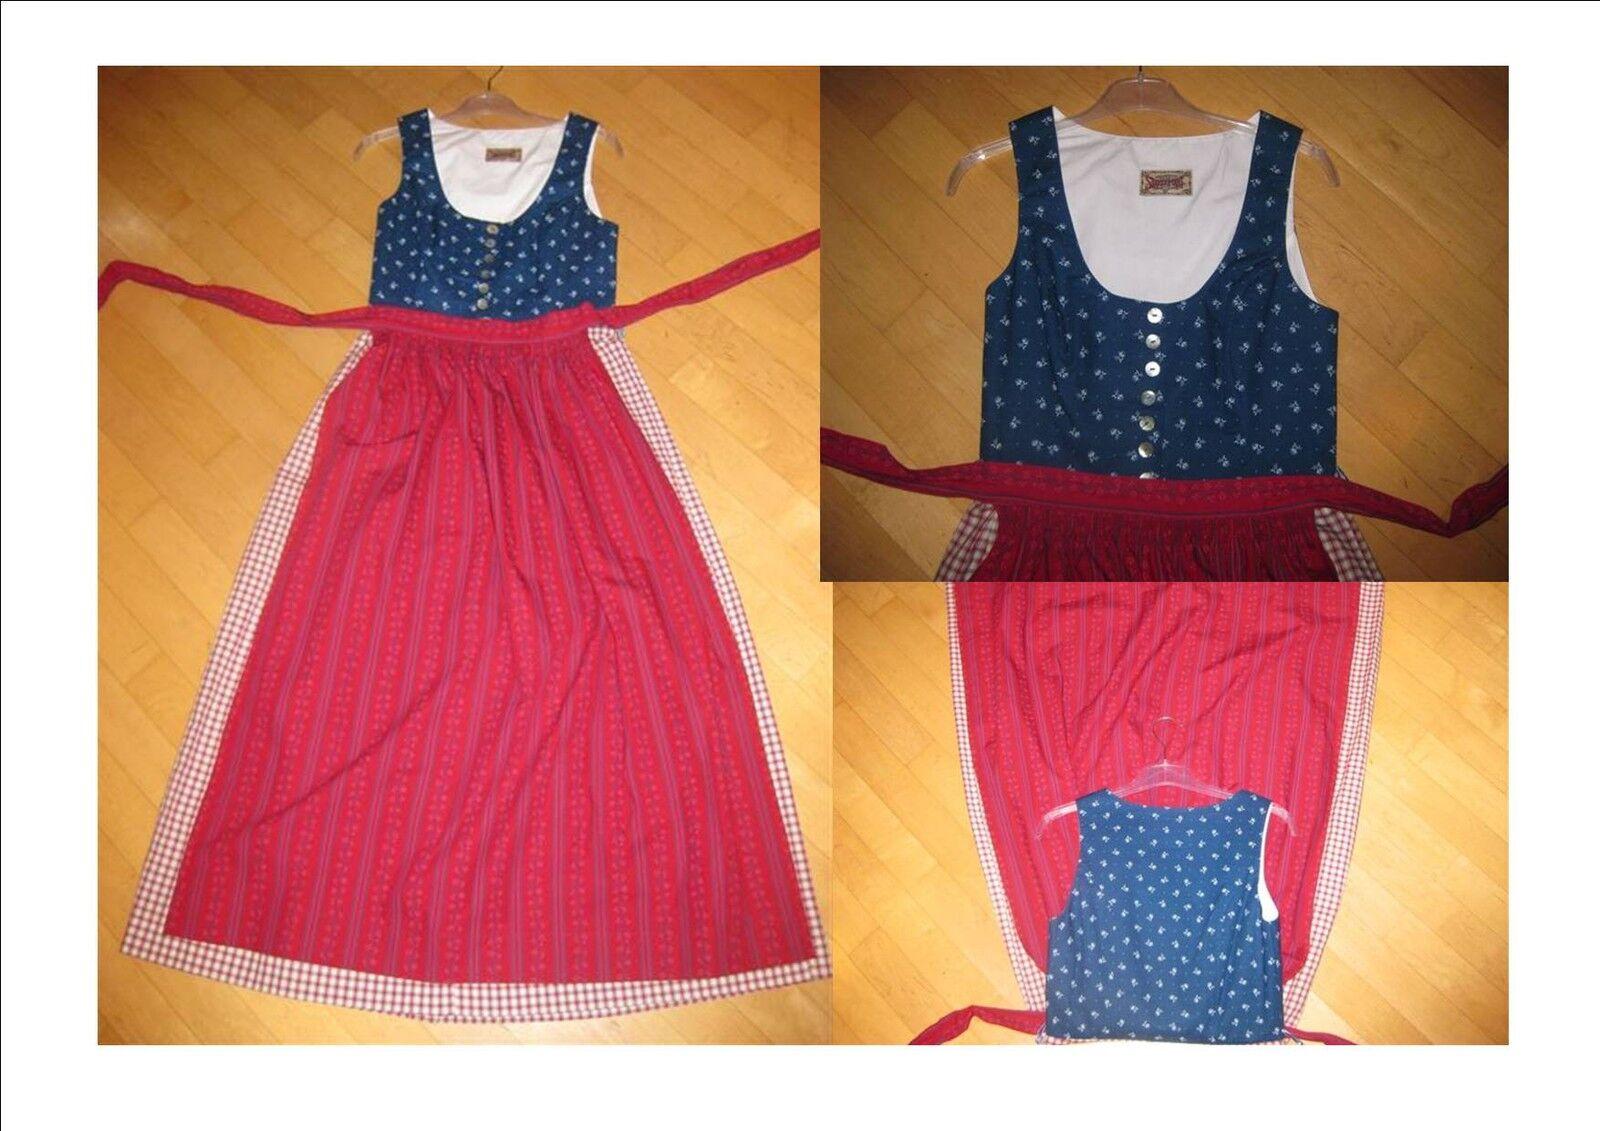 Traum Dirndl in  blau blau blau rot Gr.40  NEU   Outlet Store Online    Ausgezeichnetes Preis    Discount  621e14